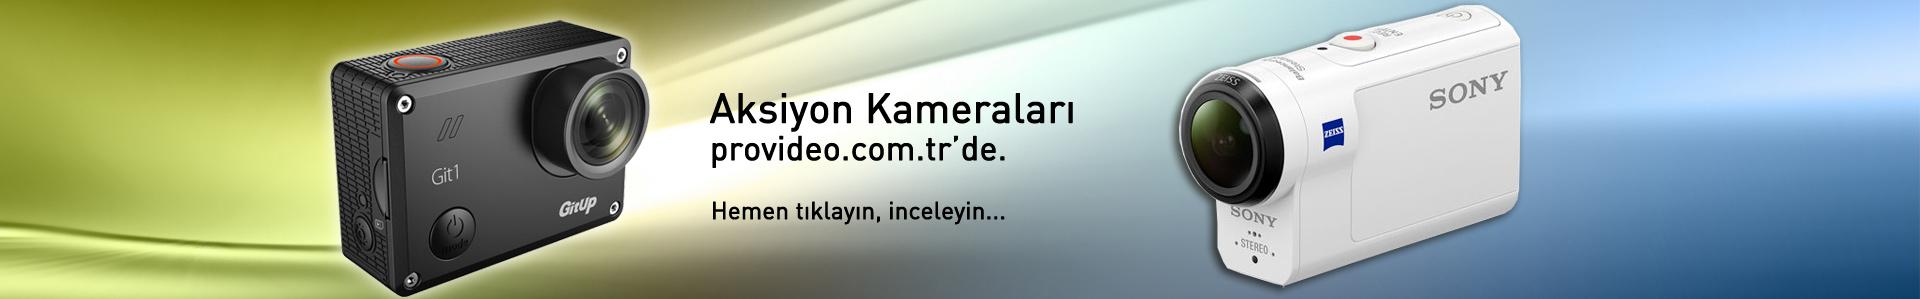 Actioncam_Slider